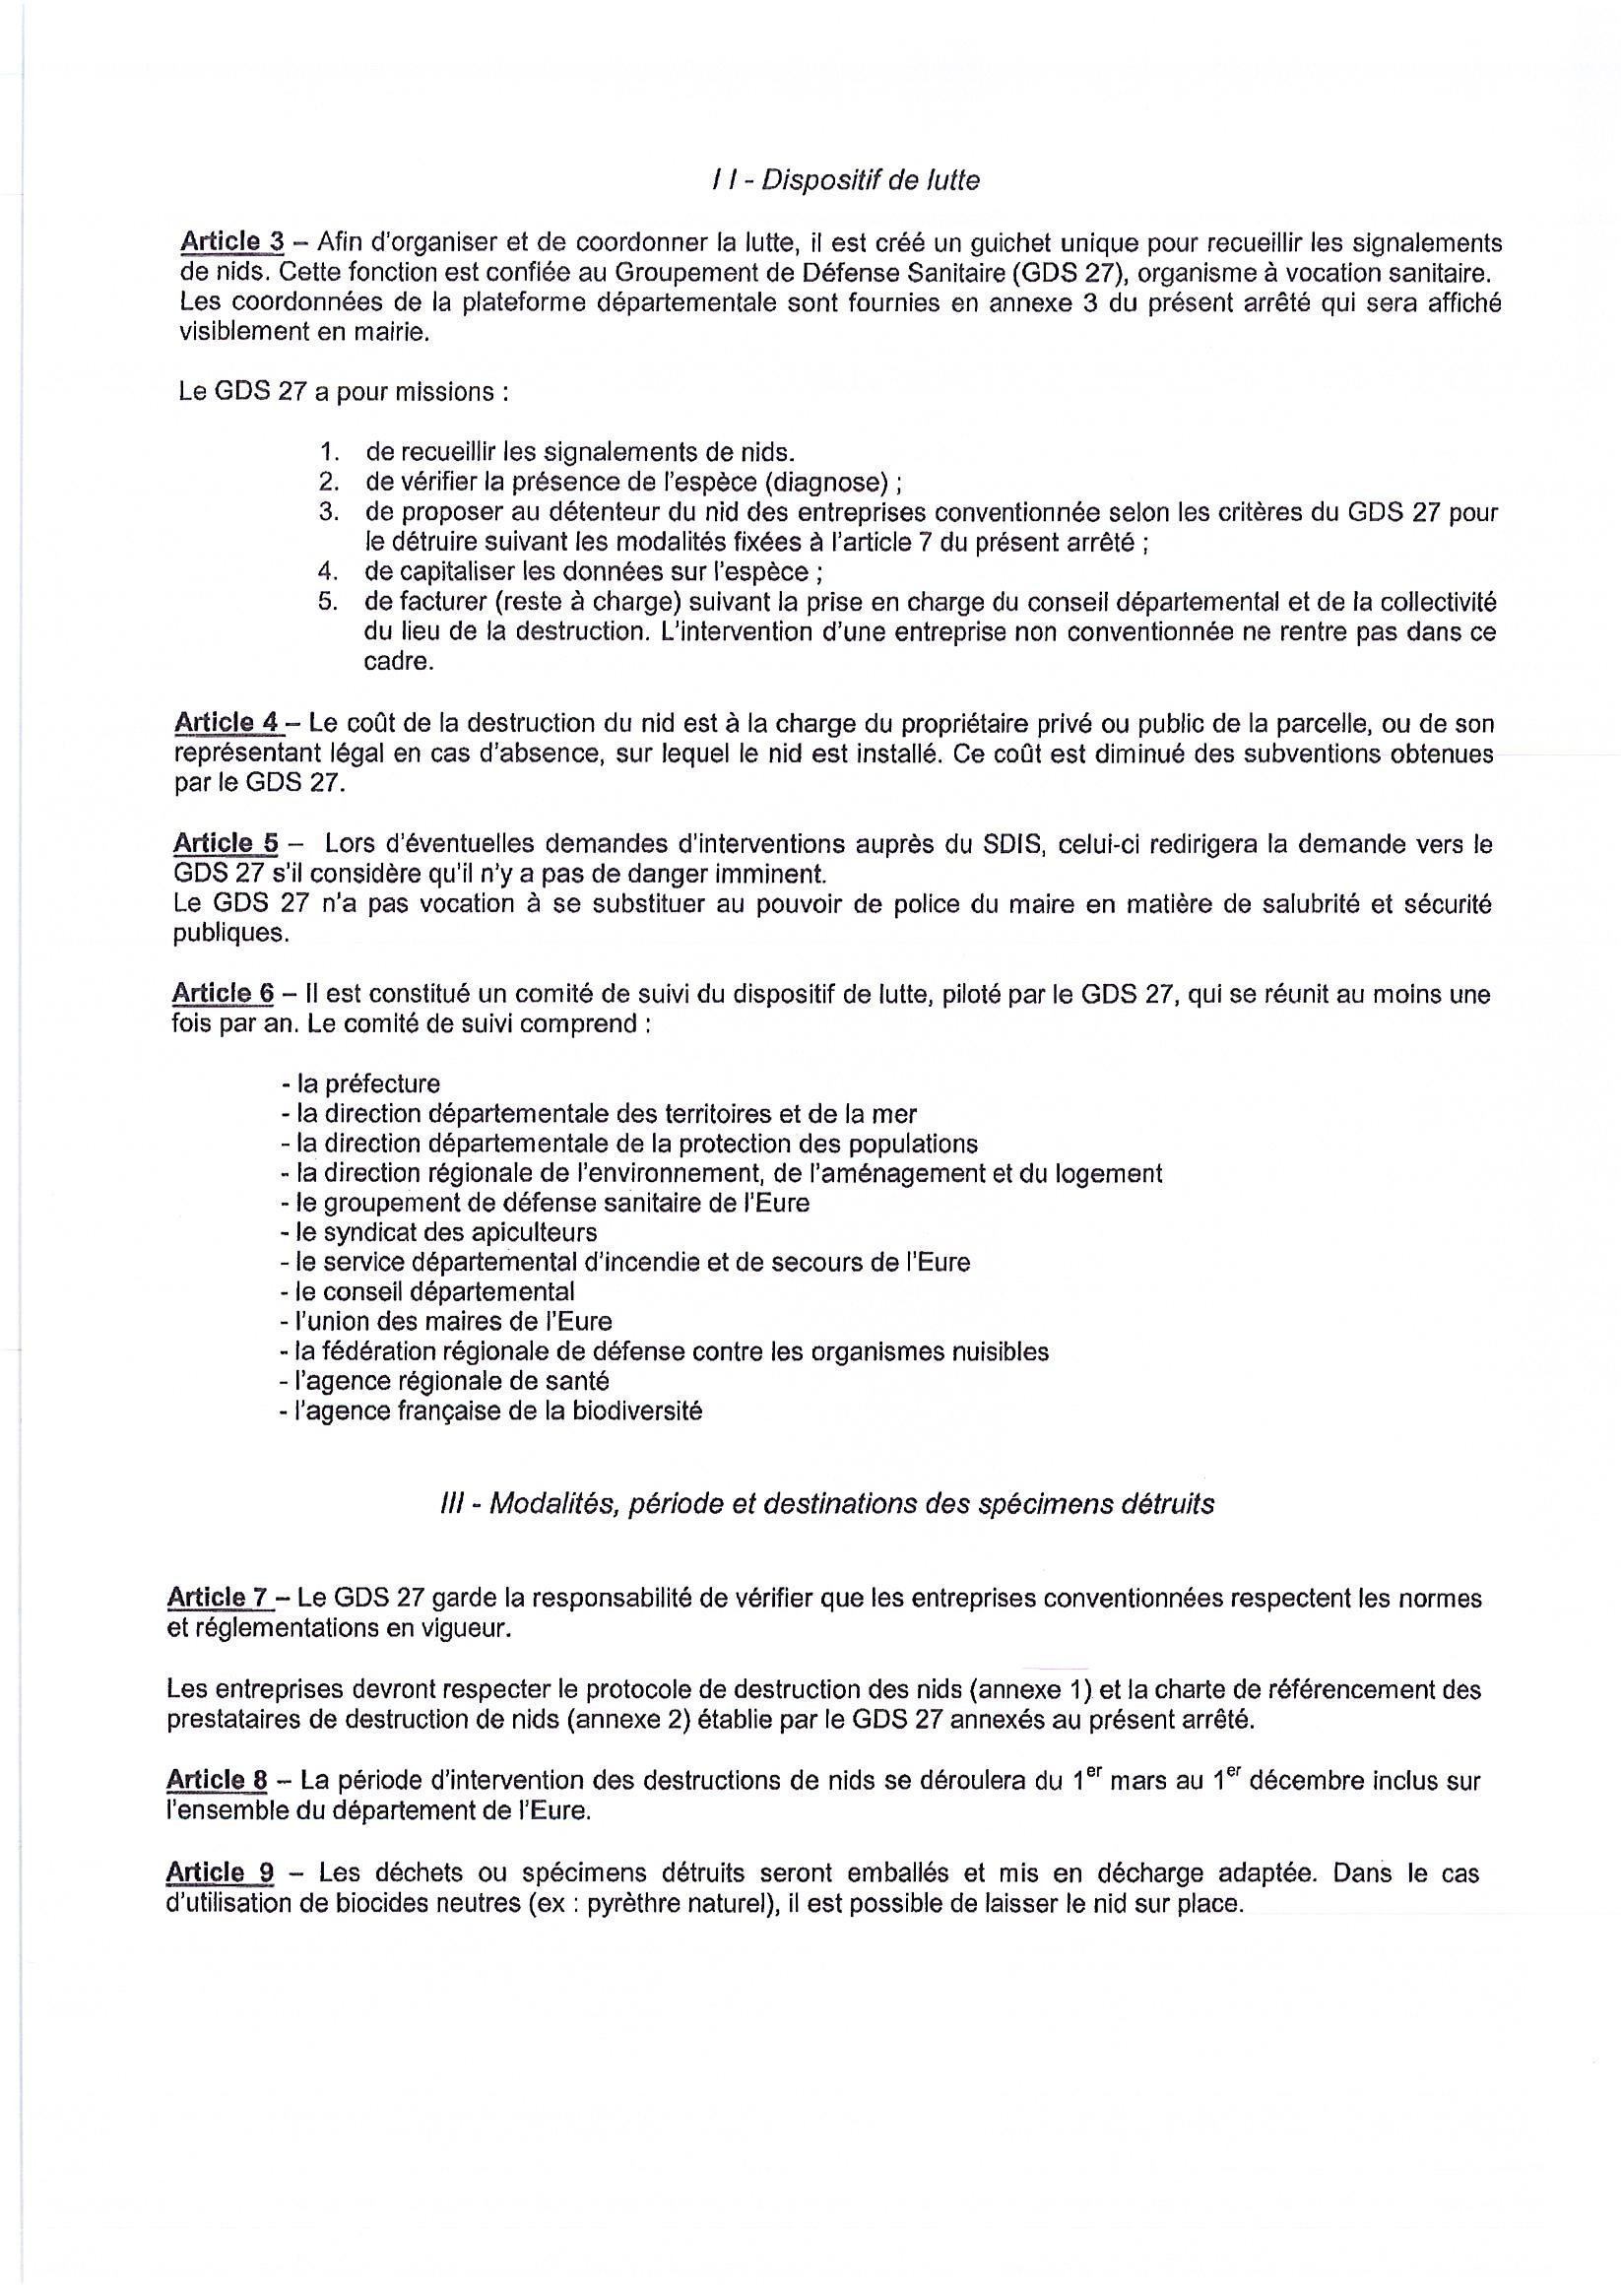 DOC250219-0002